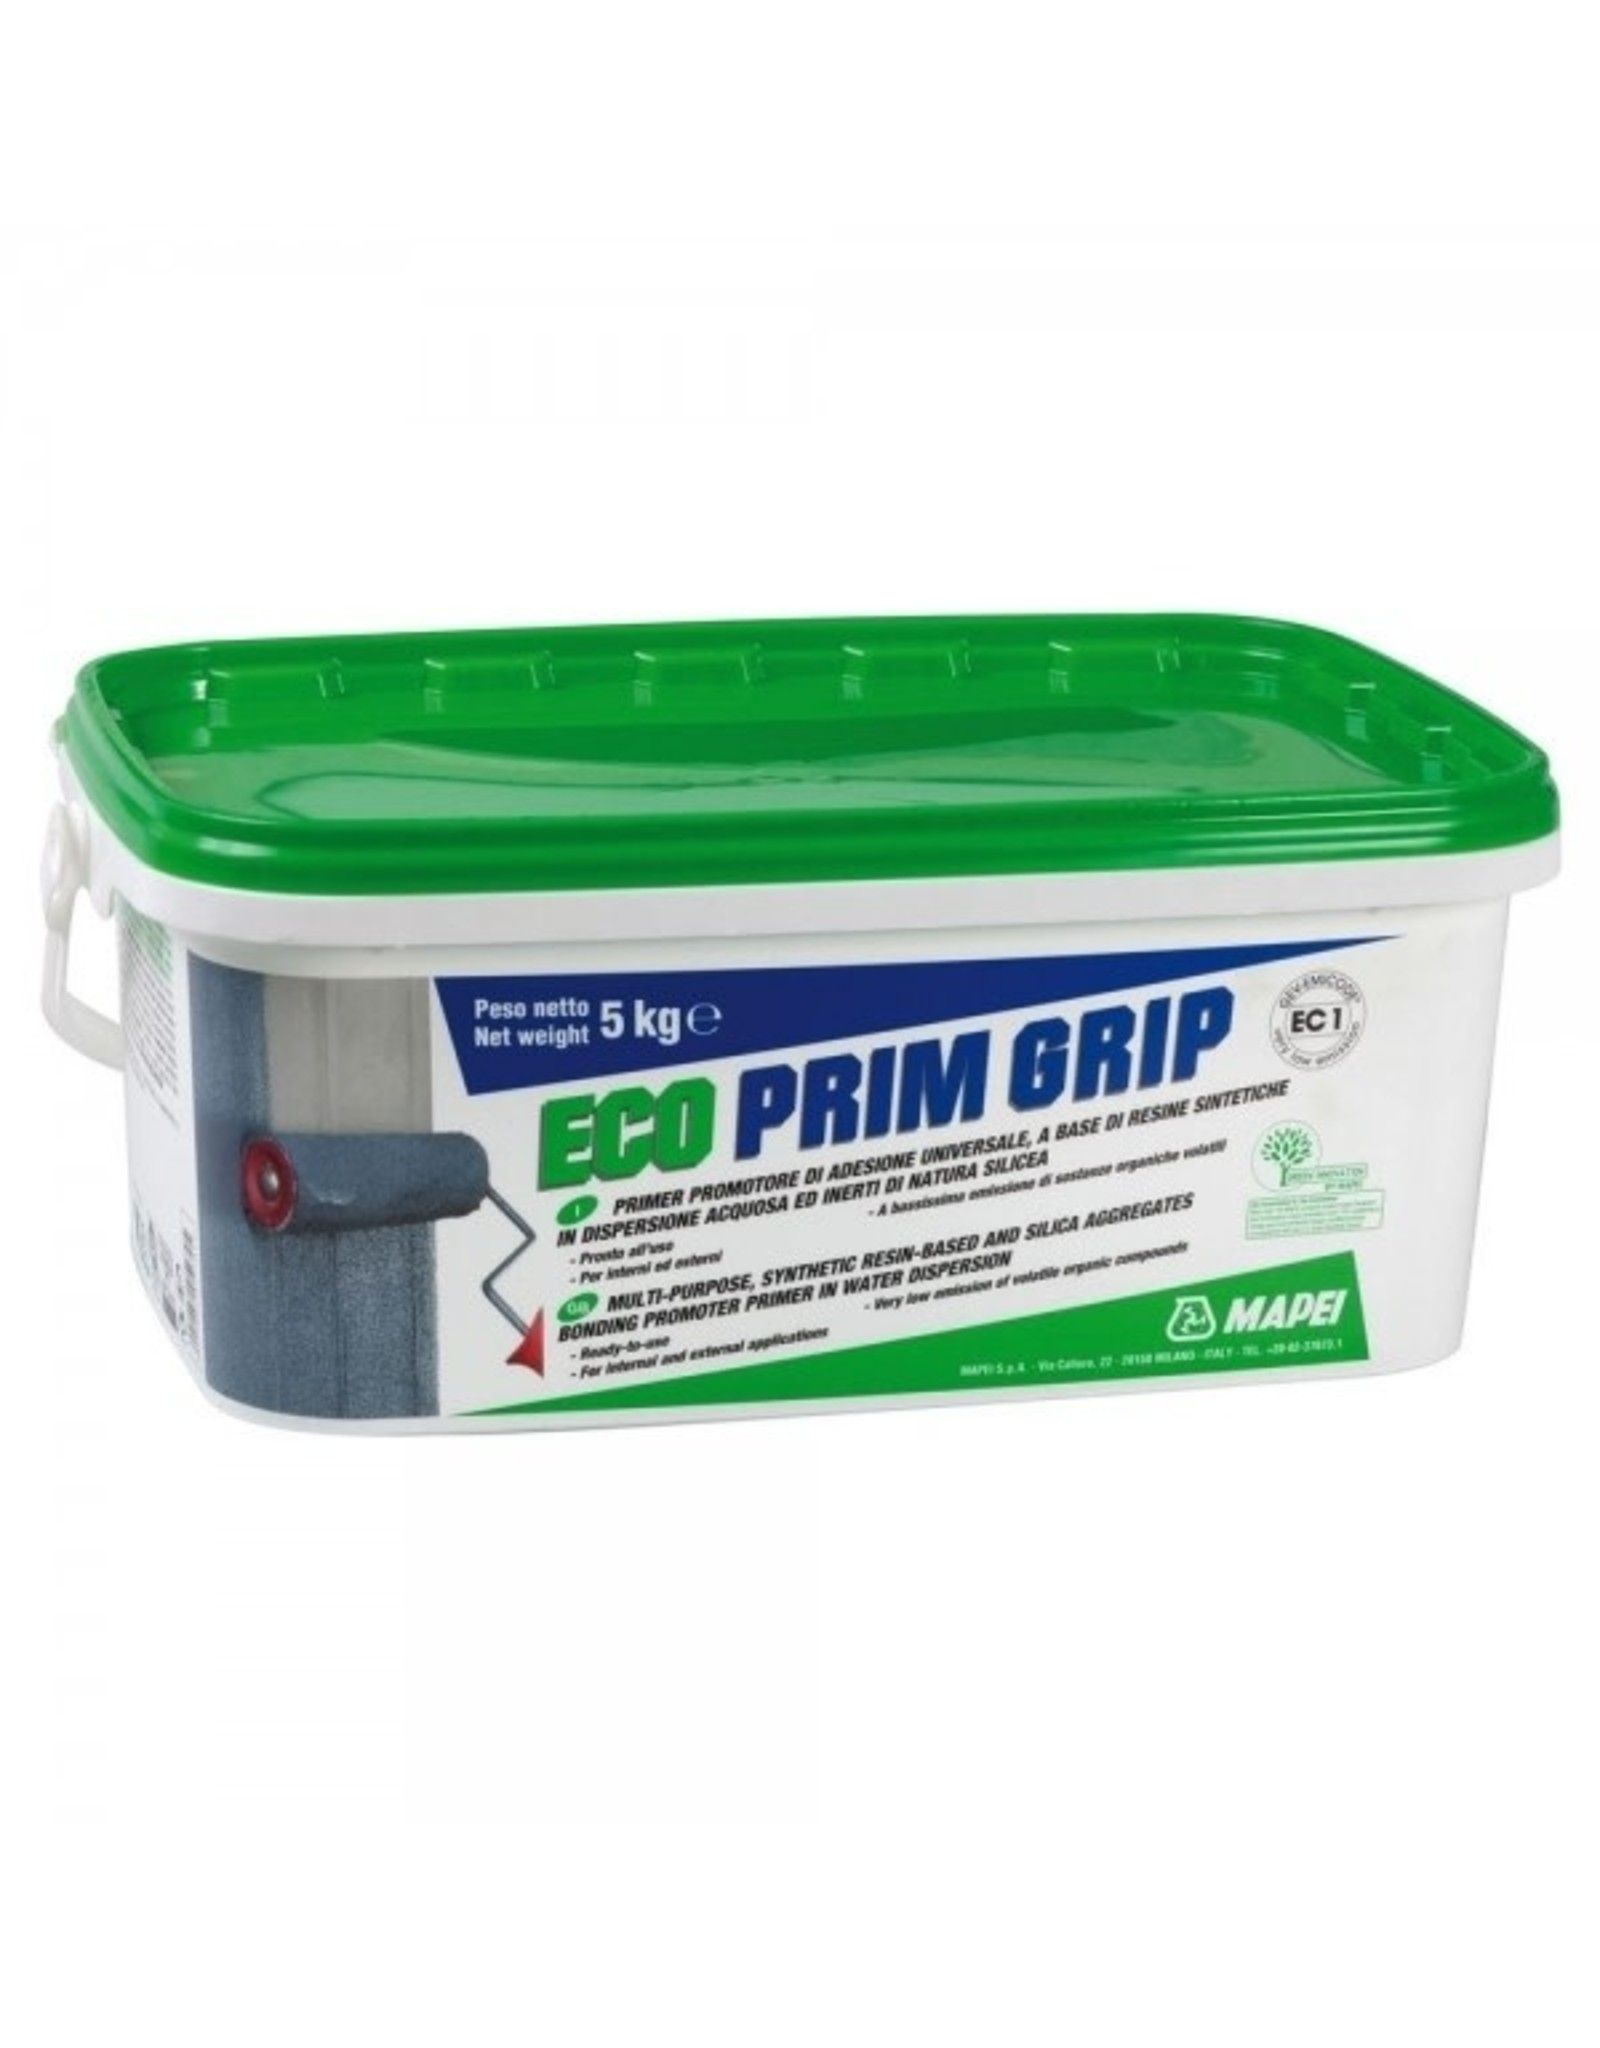 Mapei MAPEI Eco Prim Grip 5kg